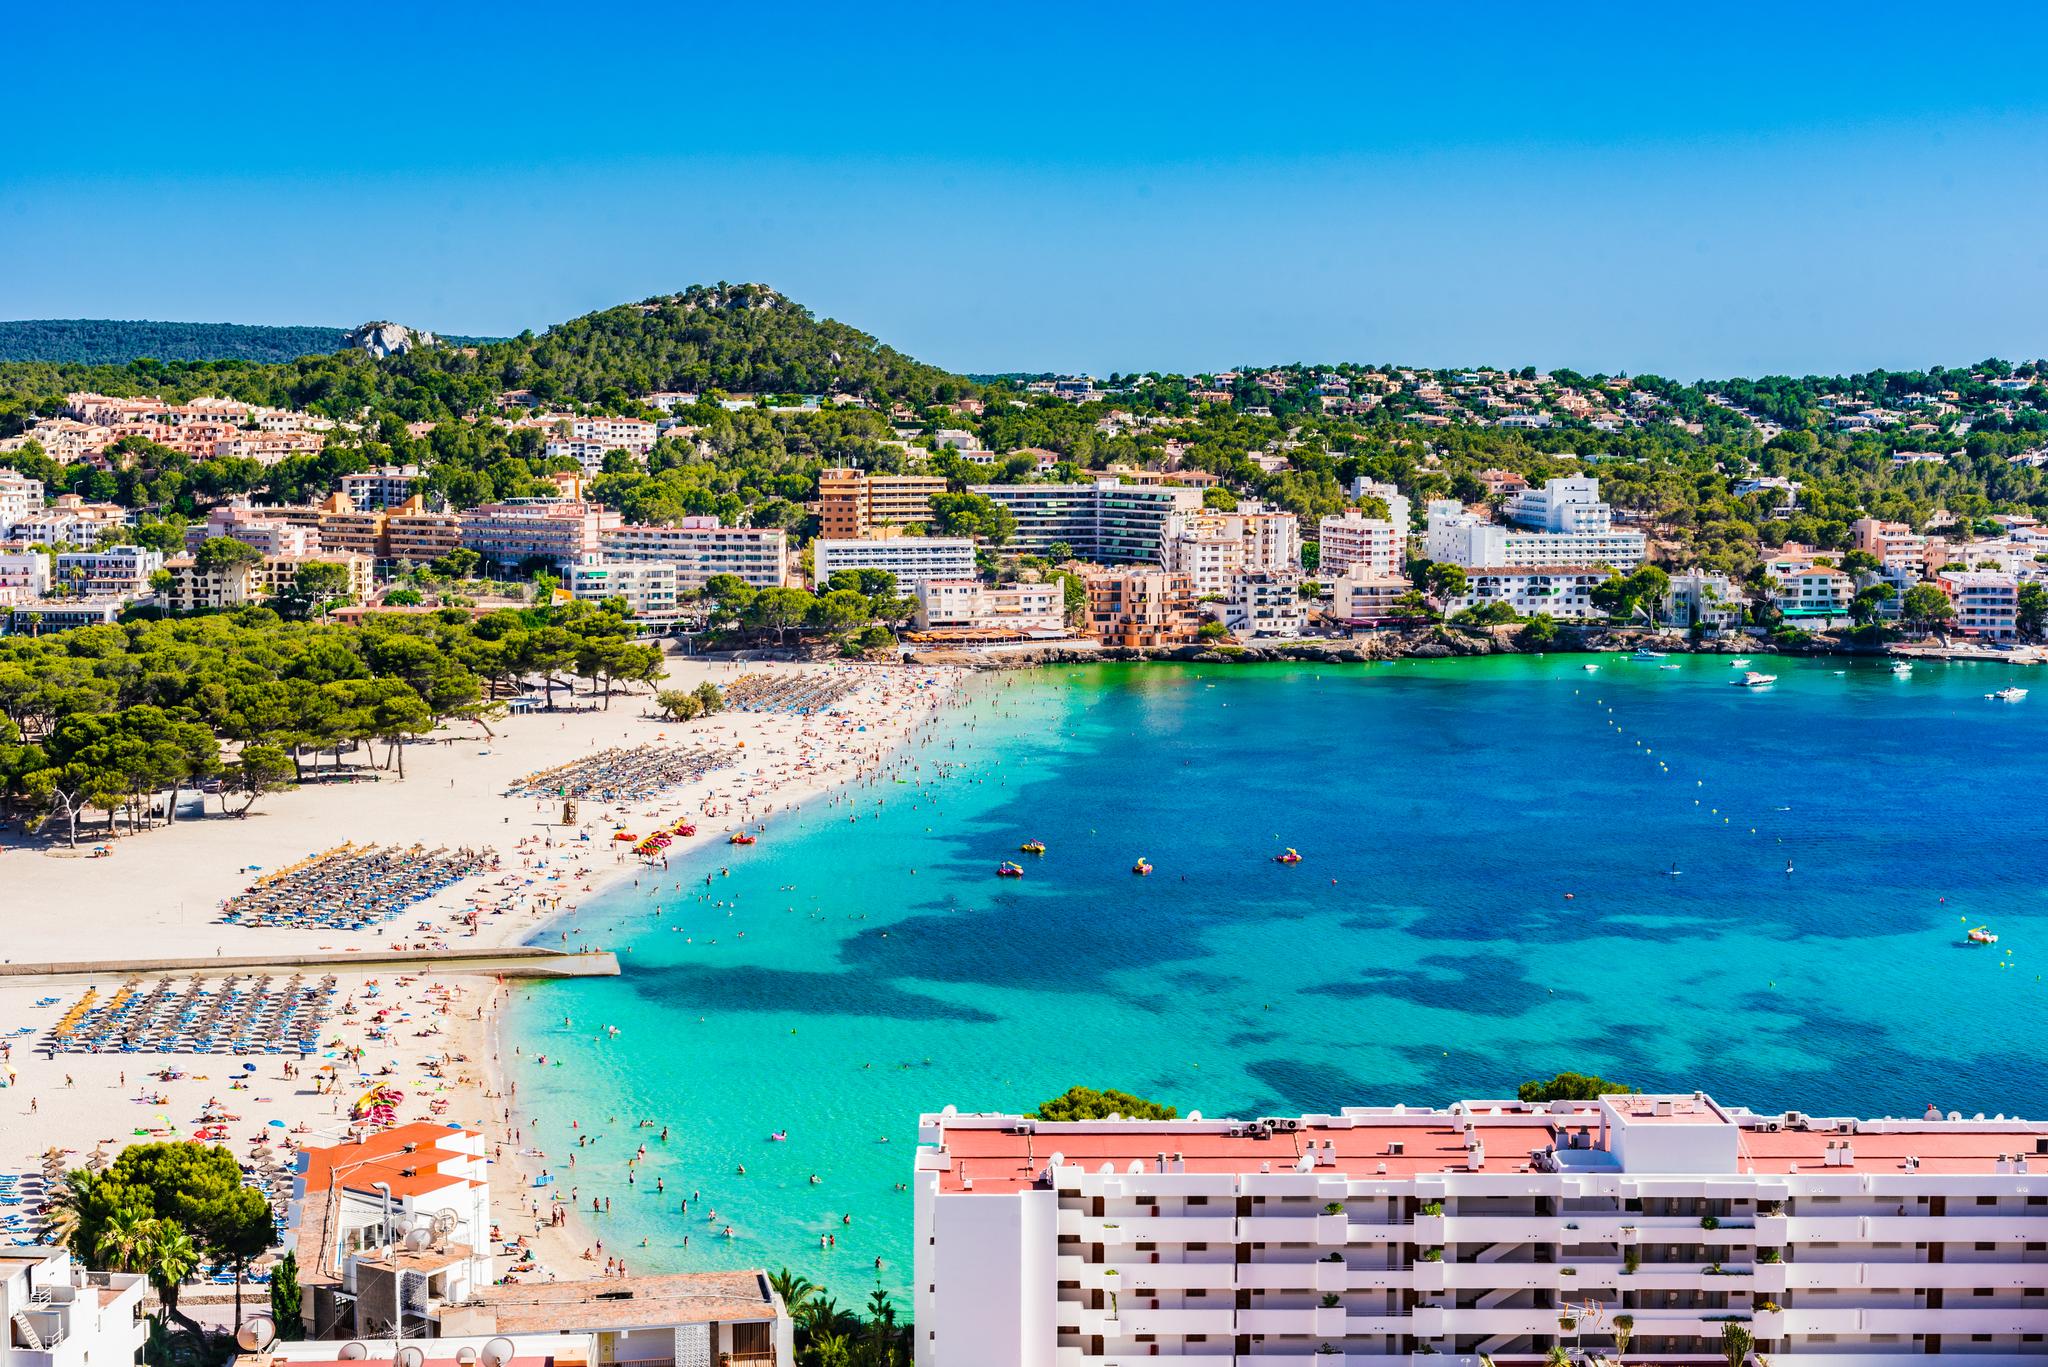 Sand beach in Santa Ponsa, seaside on lt;HIT gt;Mallorca lt;/HIT gt; island, Spain Mediterranean Sea. HOTELES Y APARTAMENTOS TURISTICOS EN LA PLAYA DE ASNTA PONSA, EN lt;HIT gt;MALLORCA lt;/HIT gt;